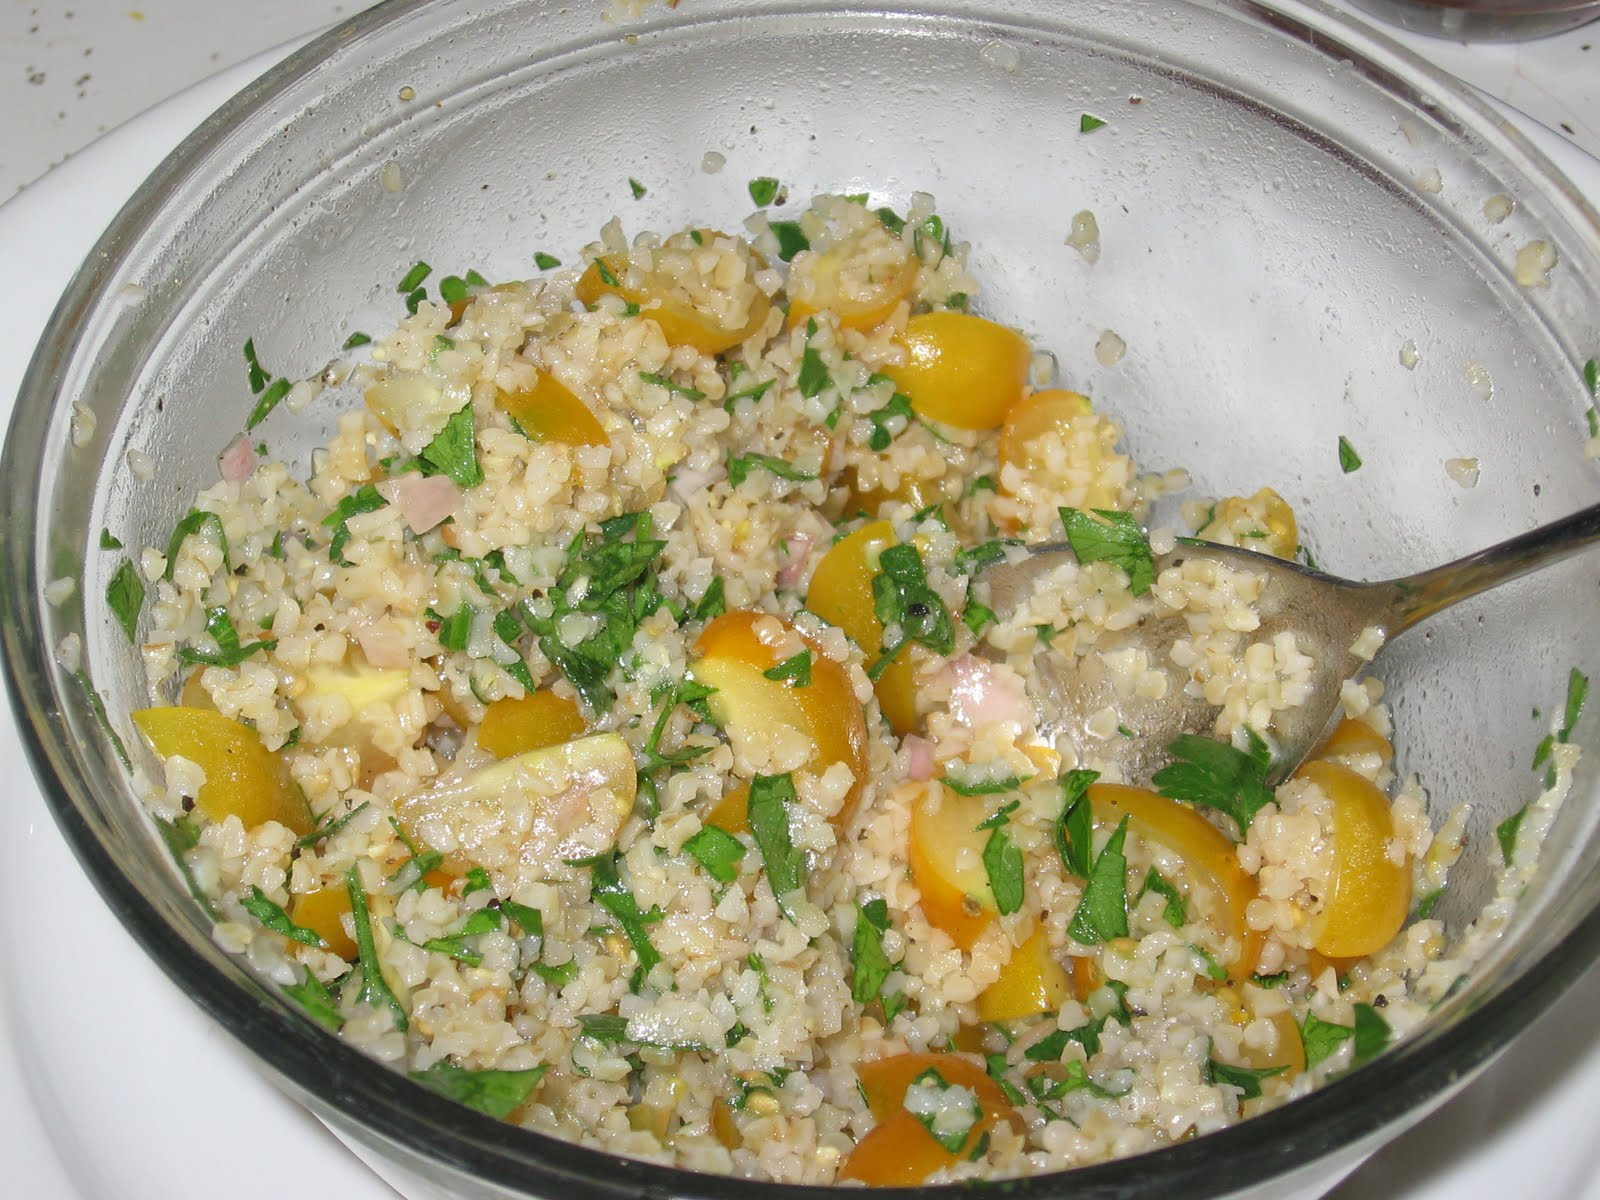 The Errant Cook: Mediterranean Grain Salad